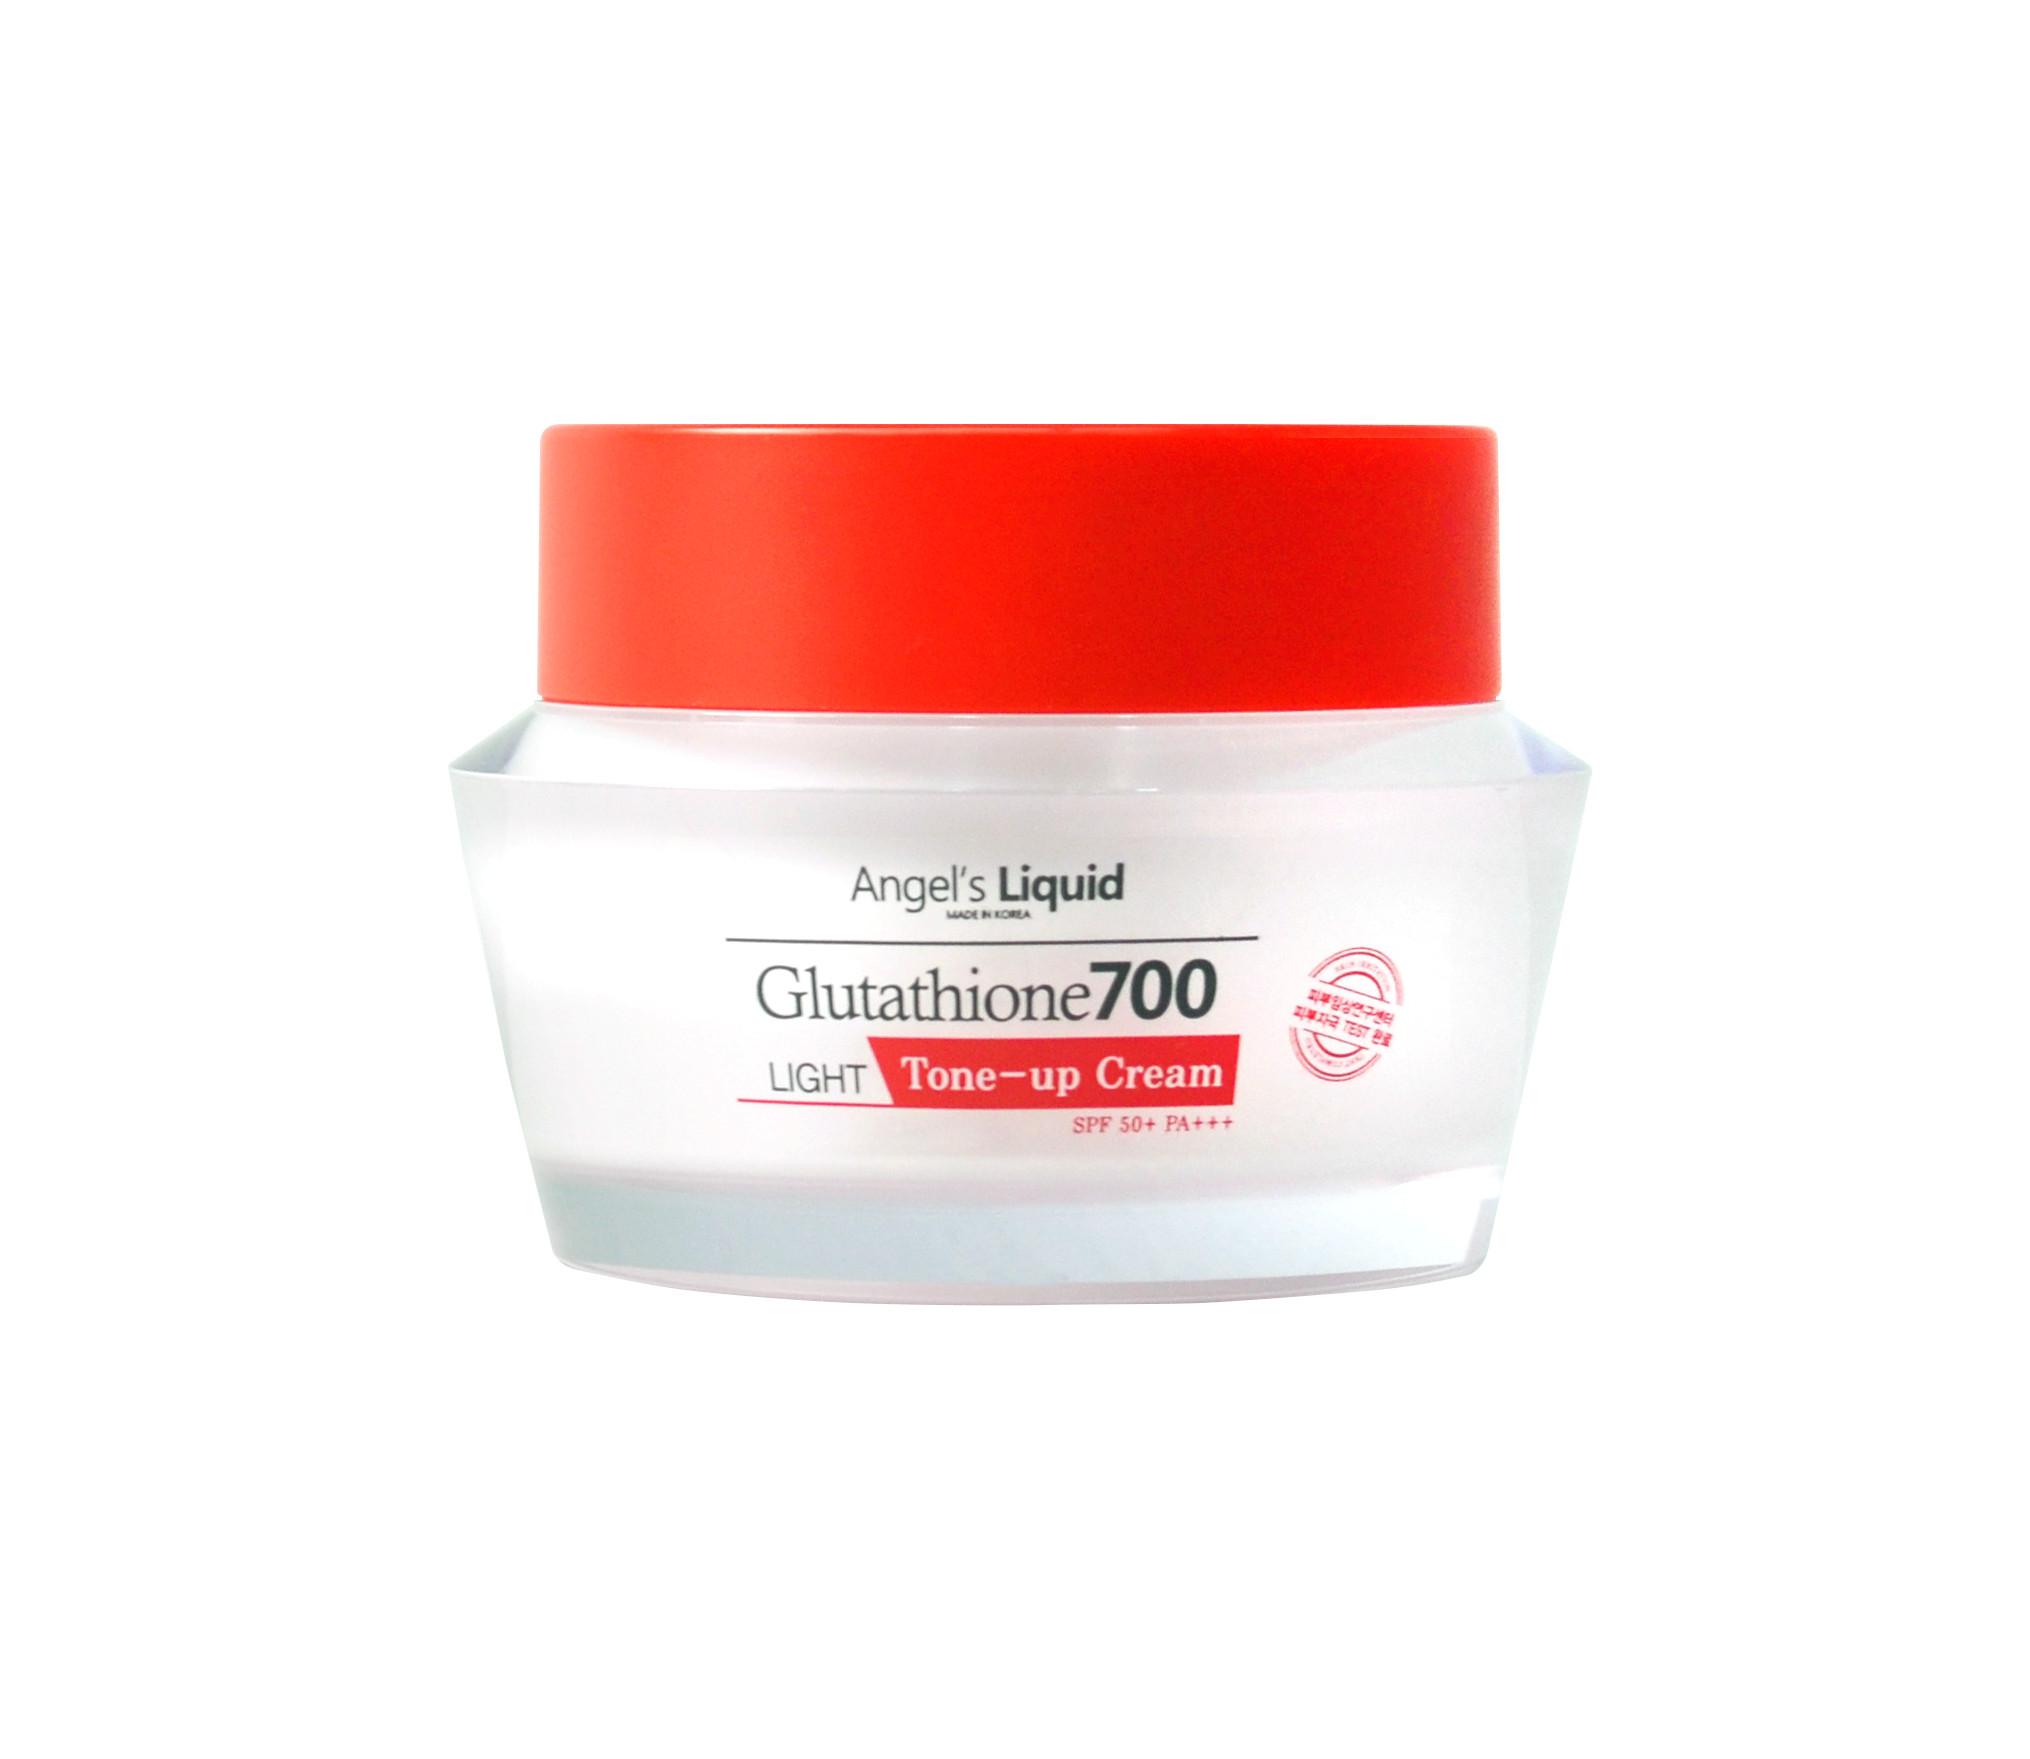 Kem Dưỡng Angel's Liquid Làm Sáng Da Glutathione 700 Light Tone-Up Cream SPF50+/PA+++ 50g